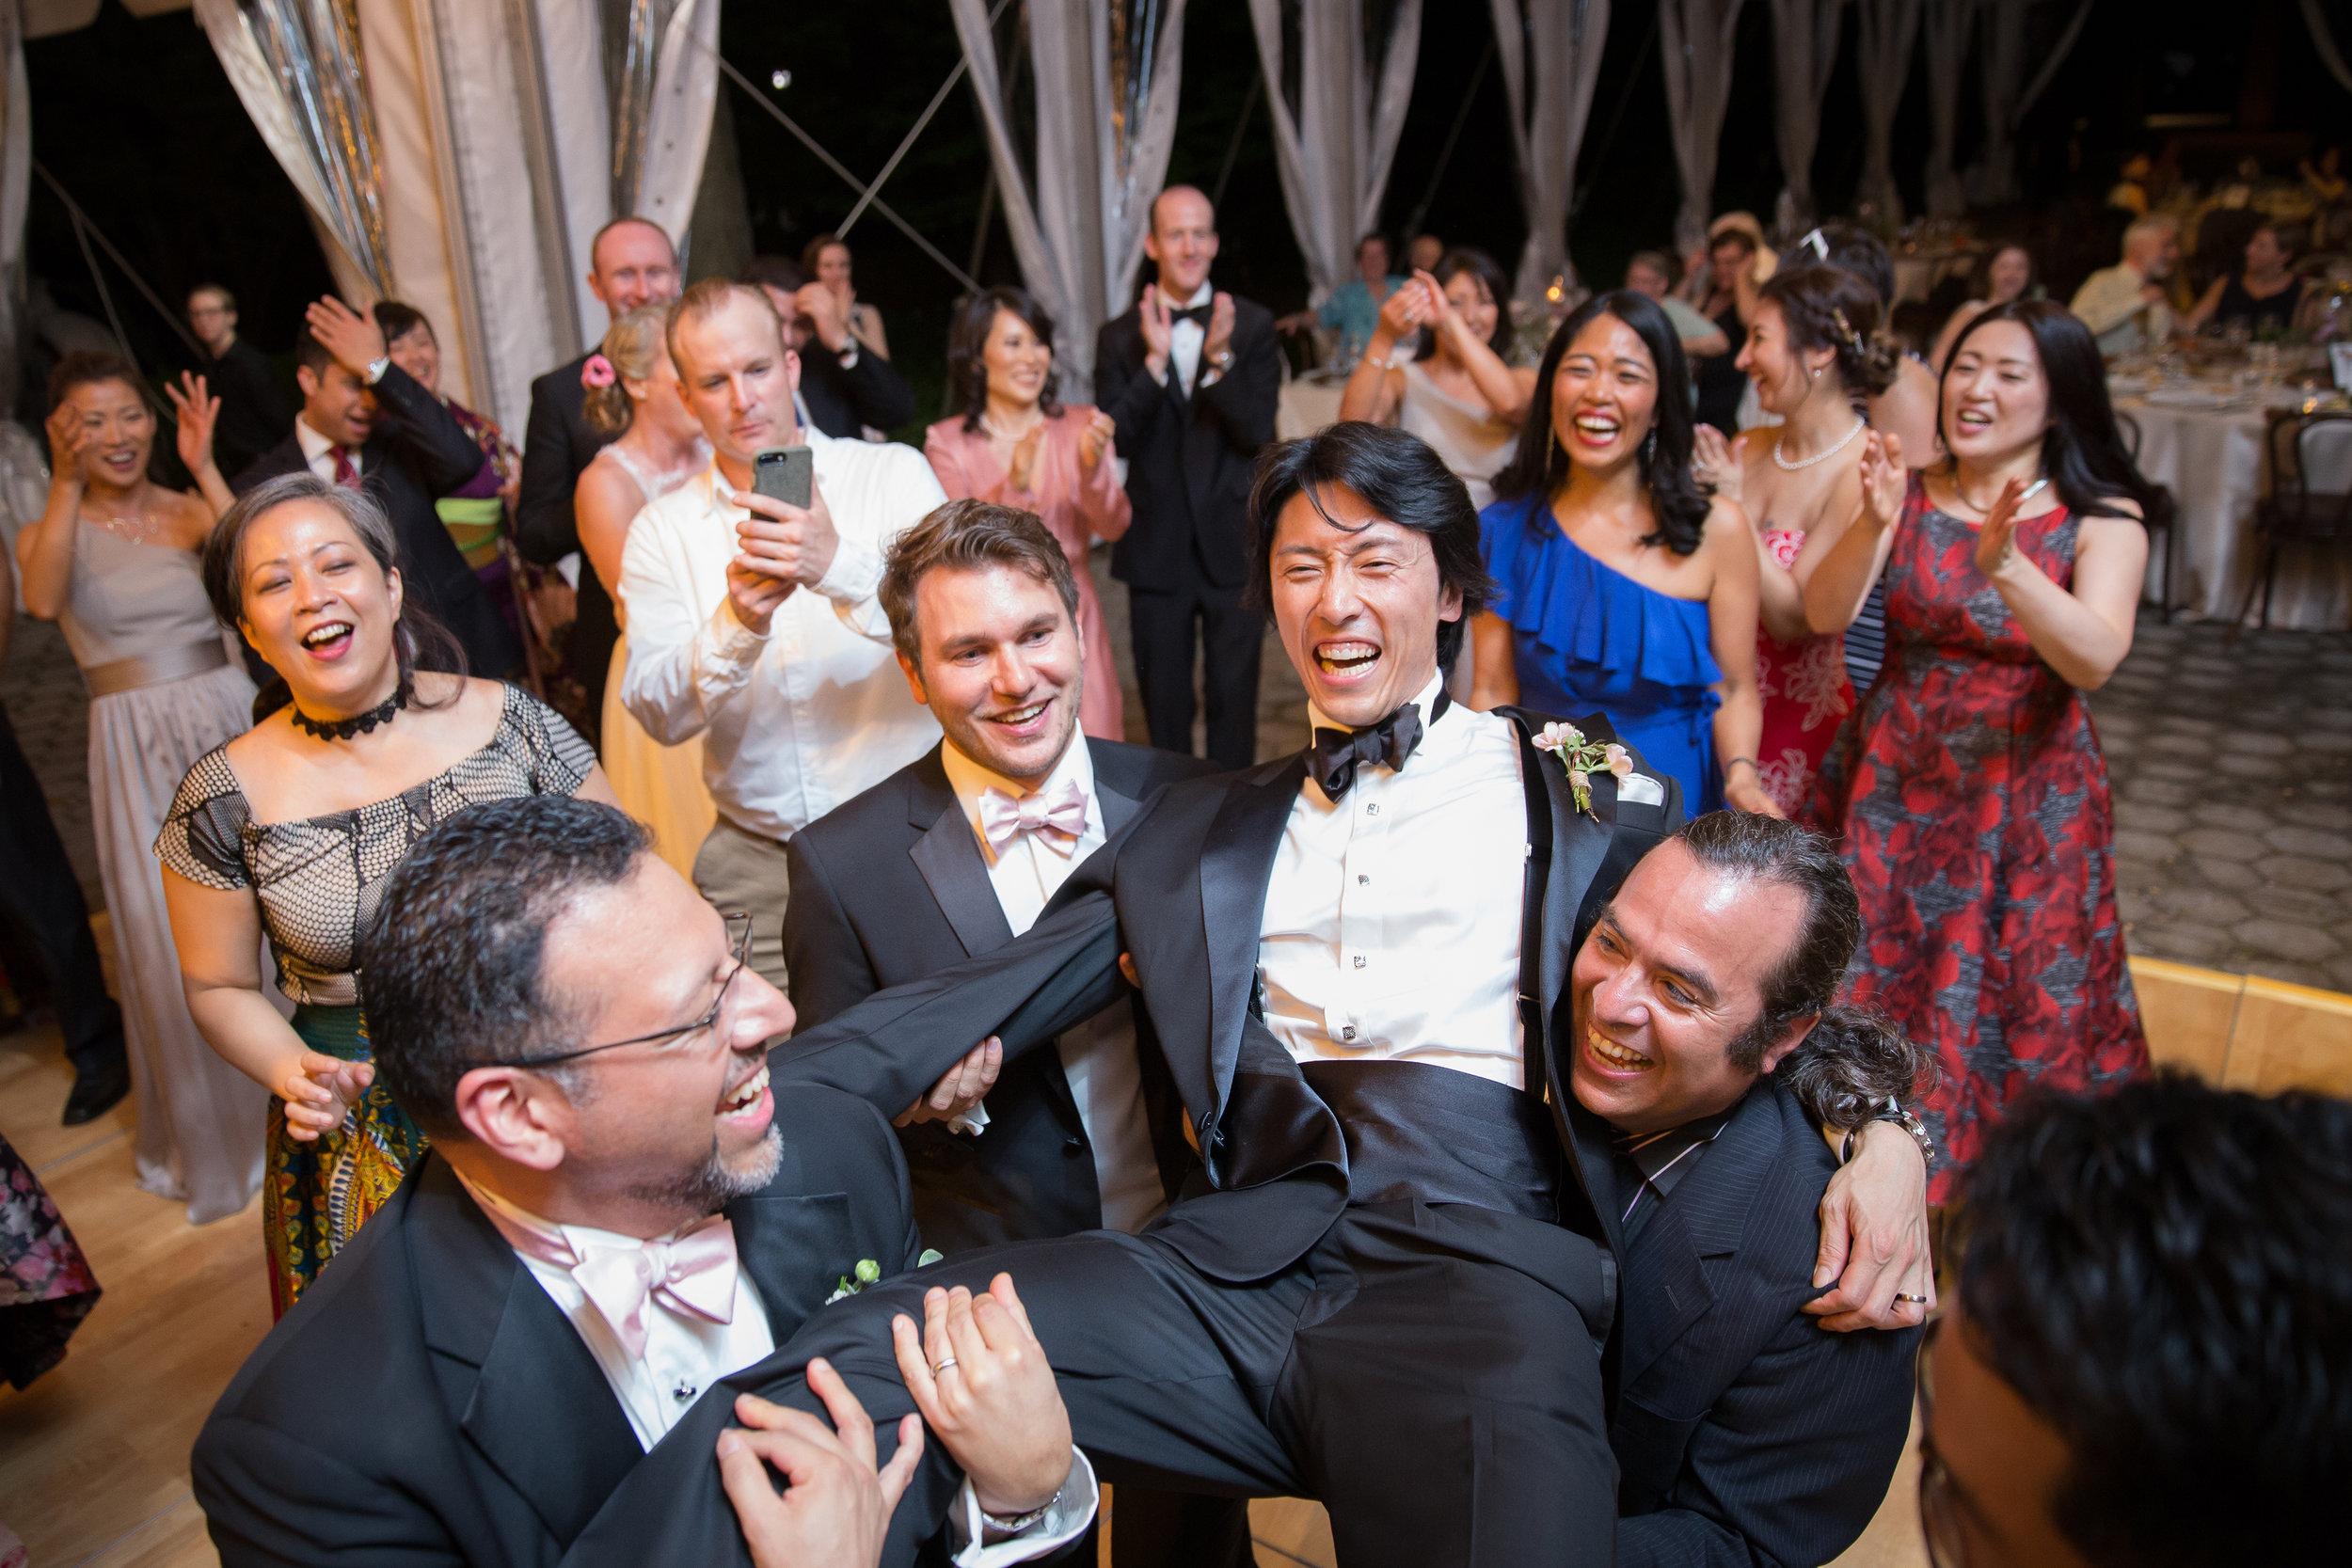 victorious-events-nyc-034-colleen-taka-central-park-zoo-wedding-raymond-hamlin.jpg